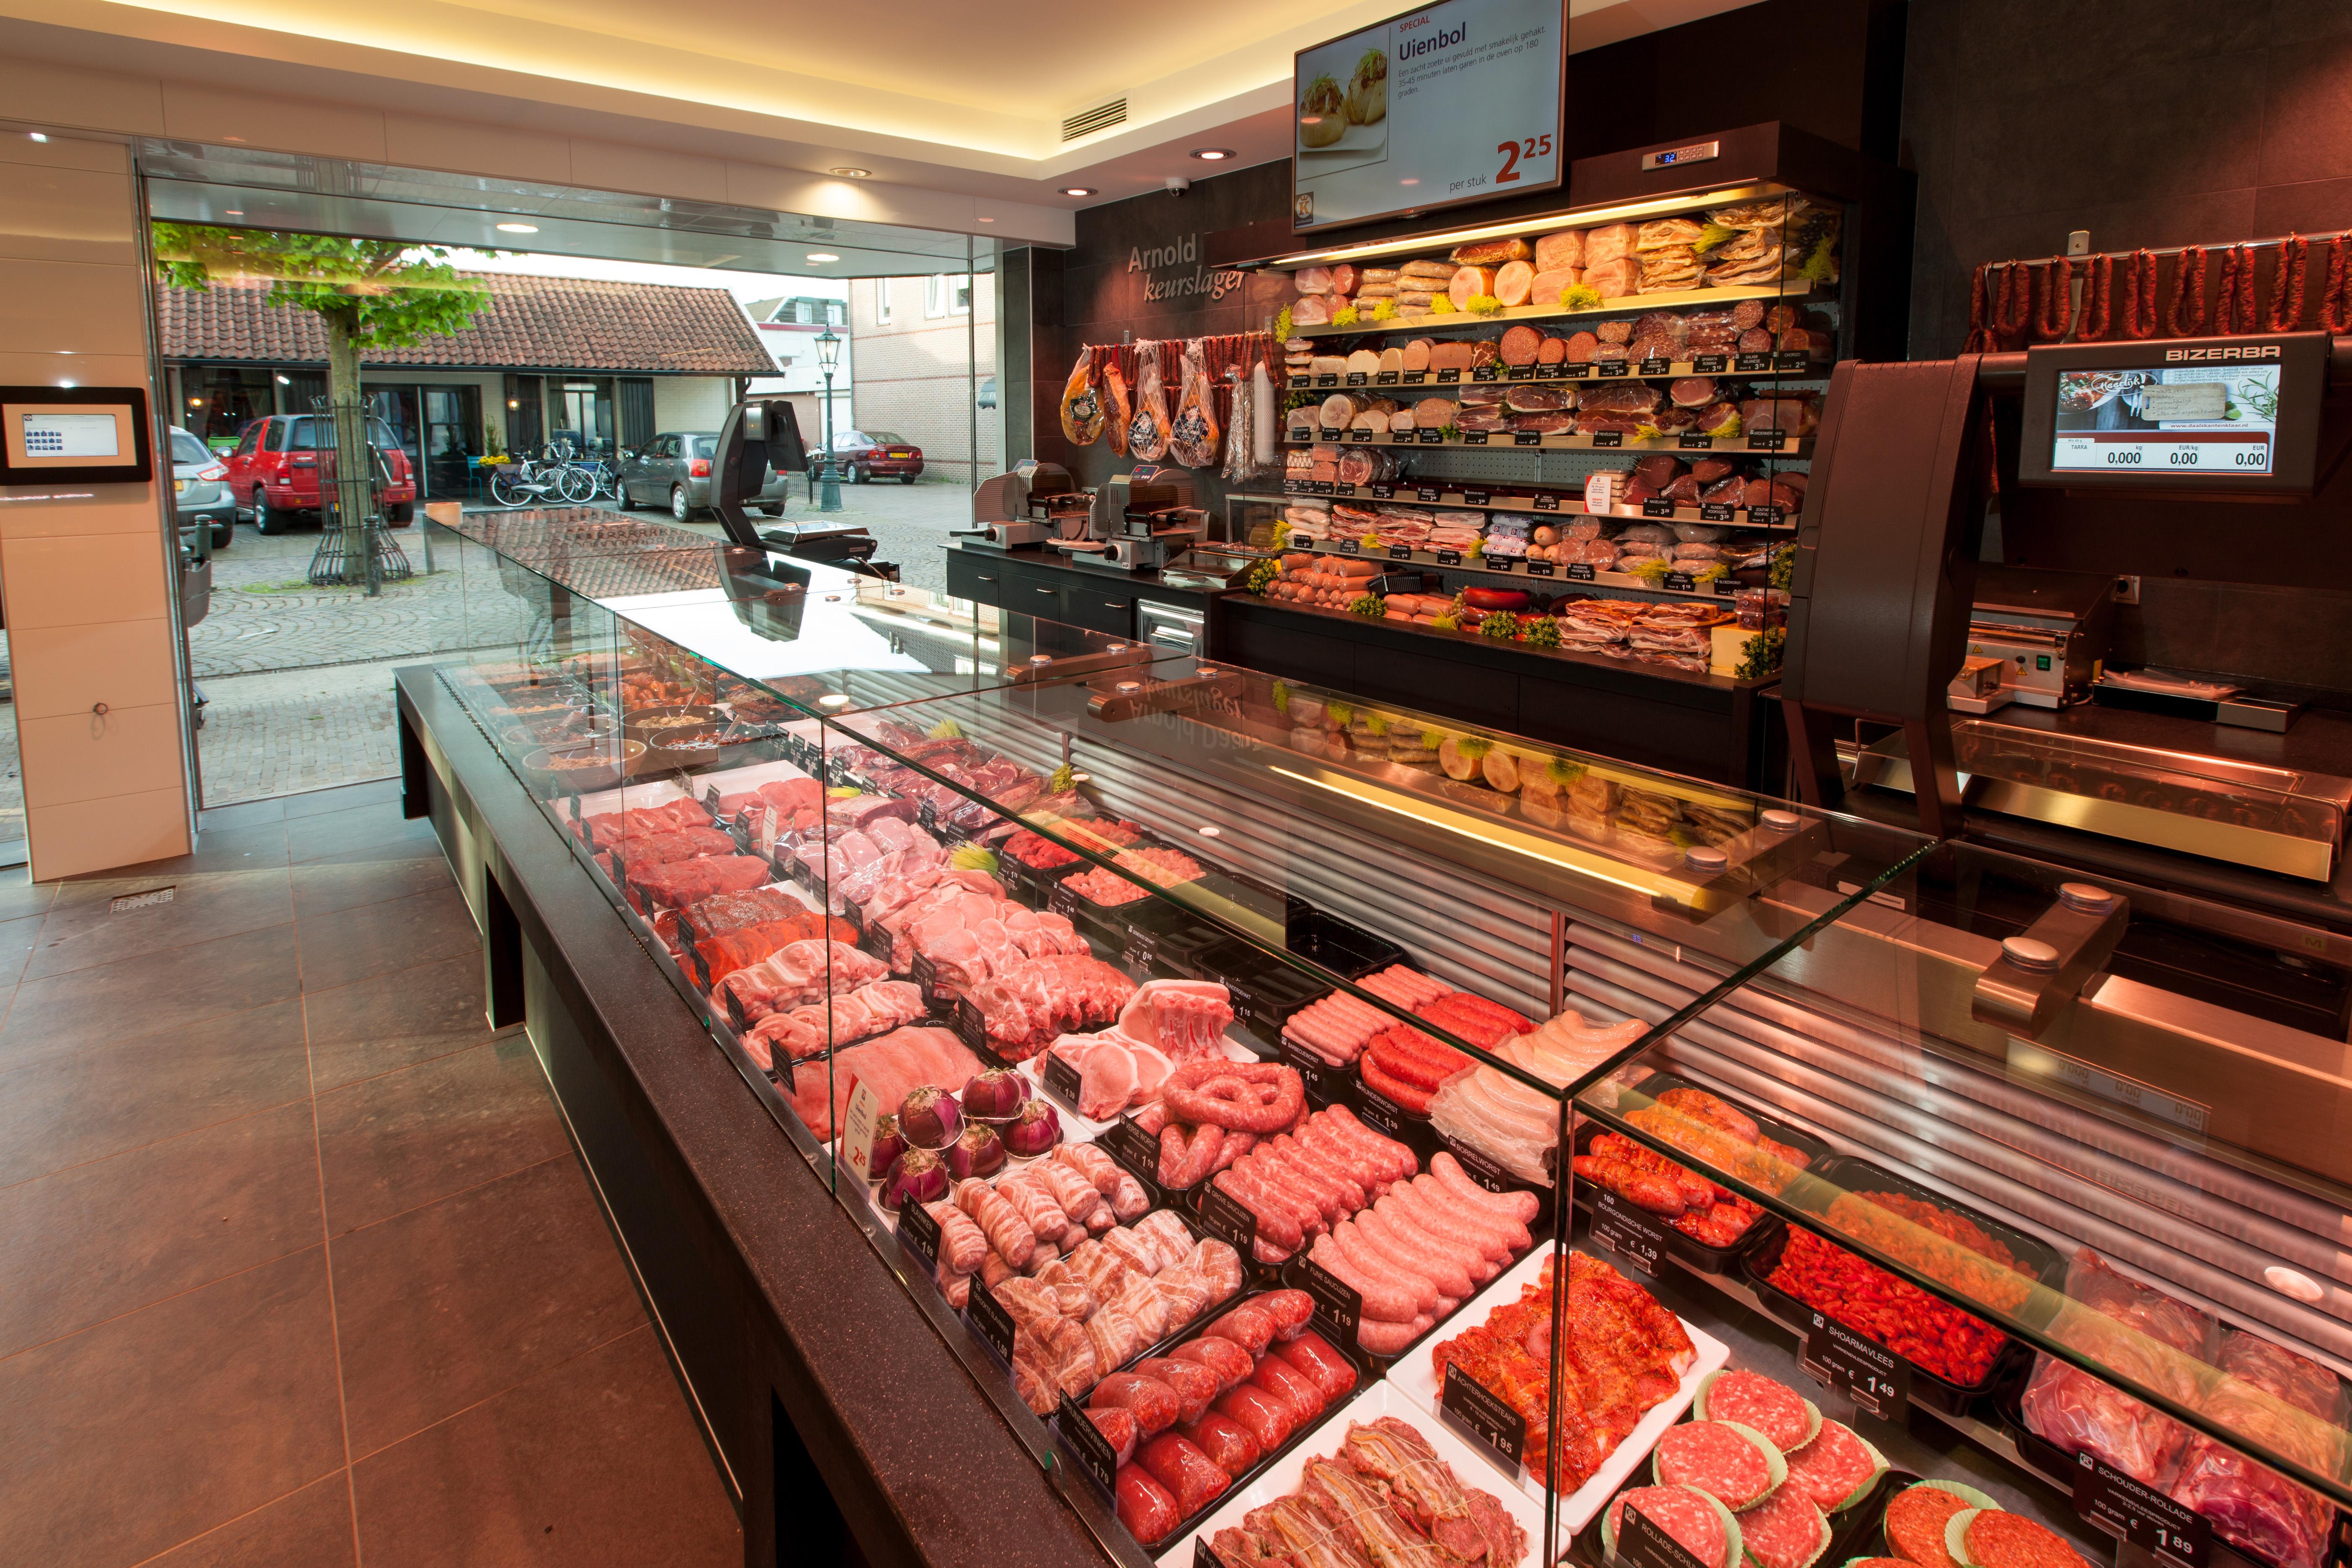 Keurslager Arnold Daals winkel